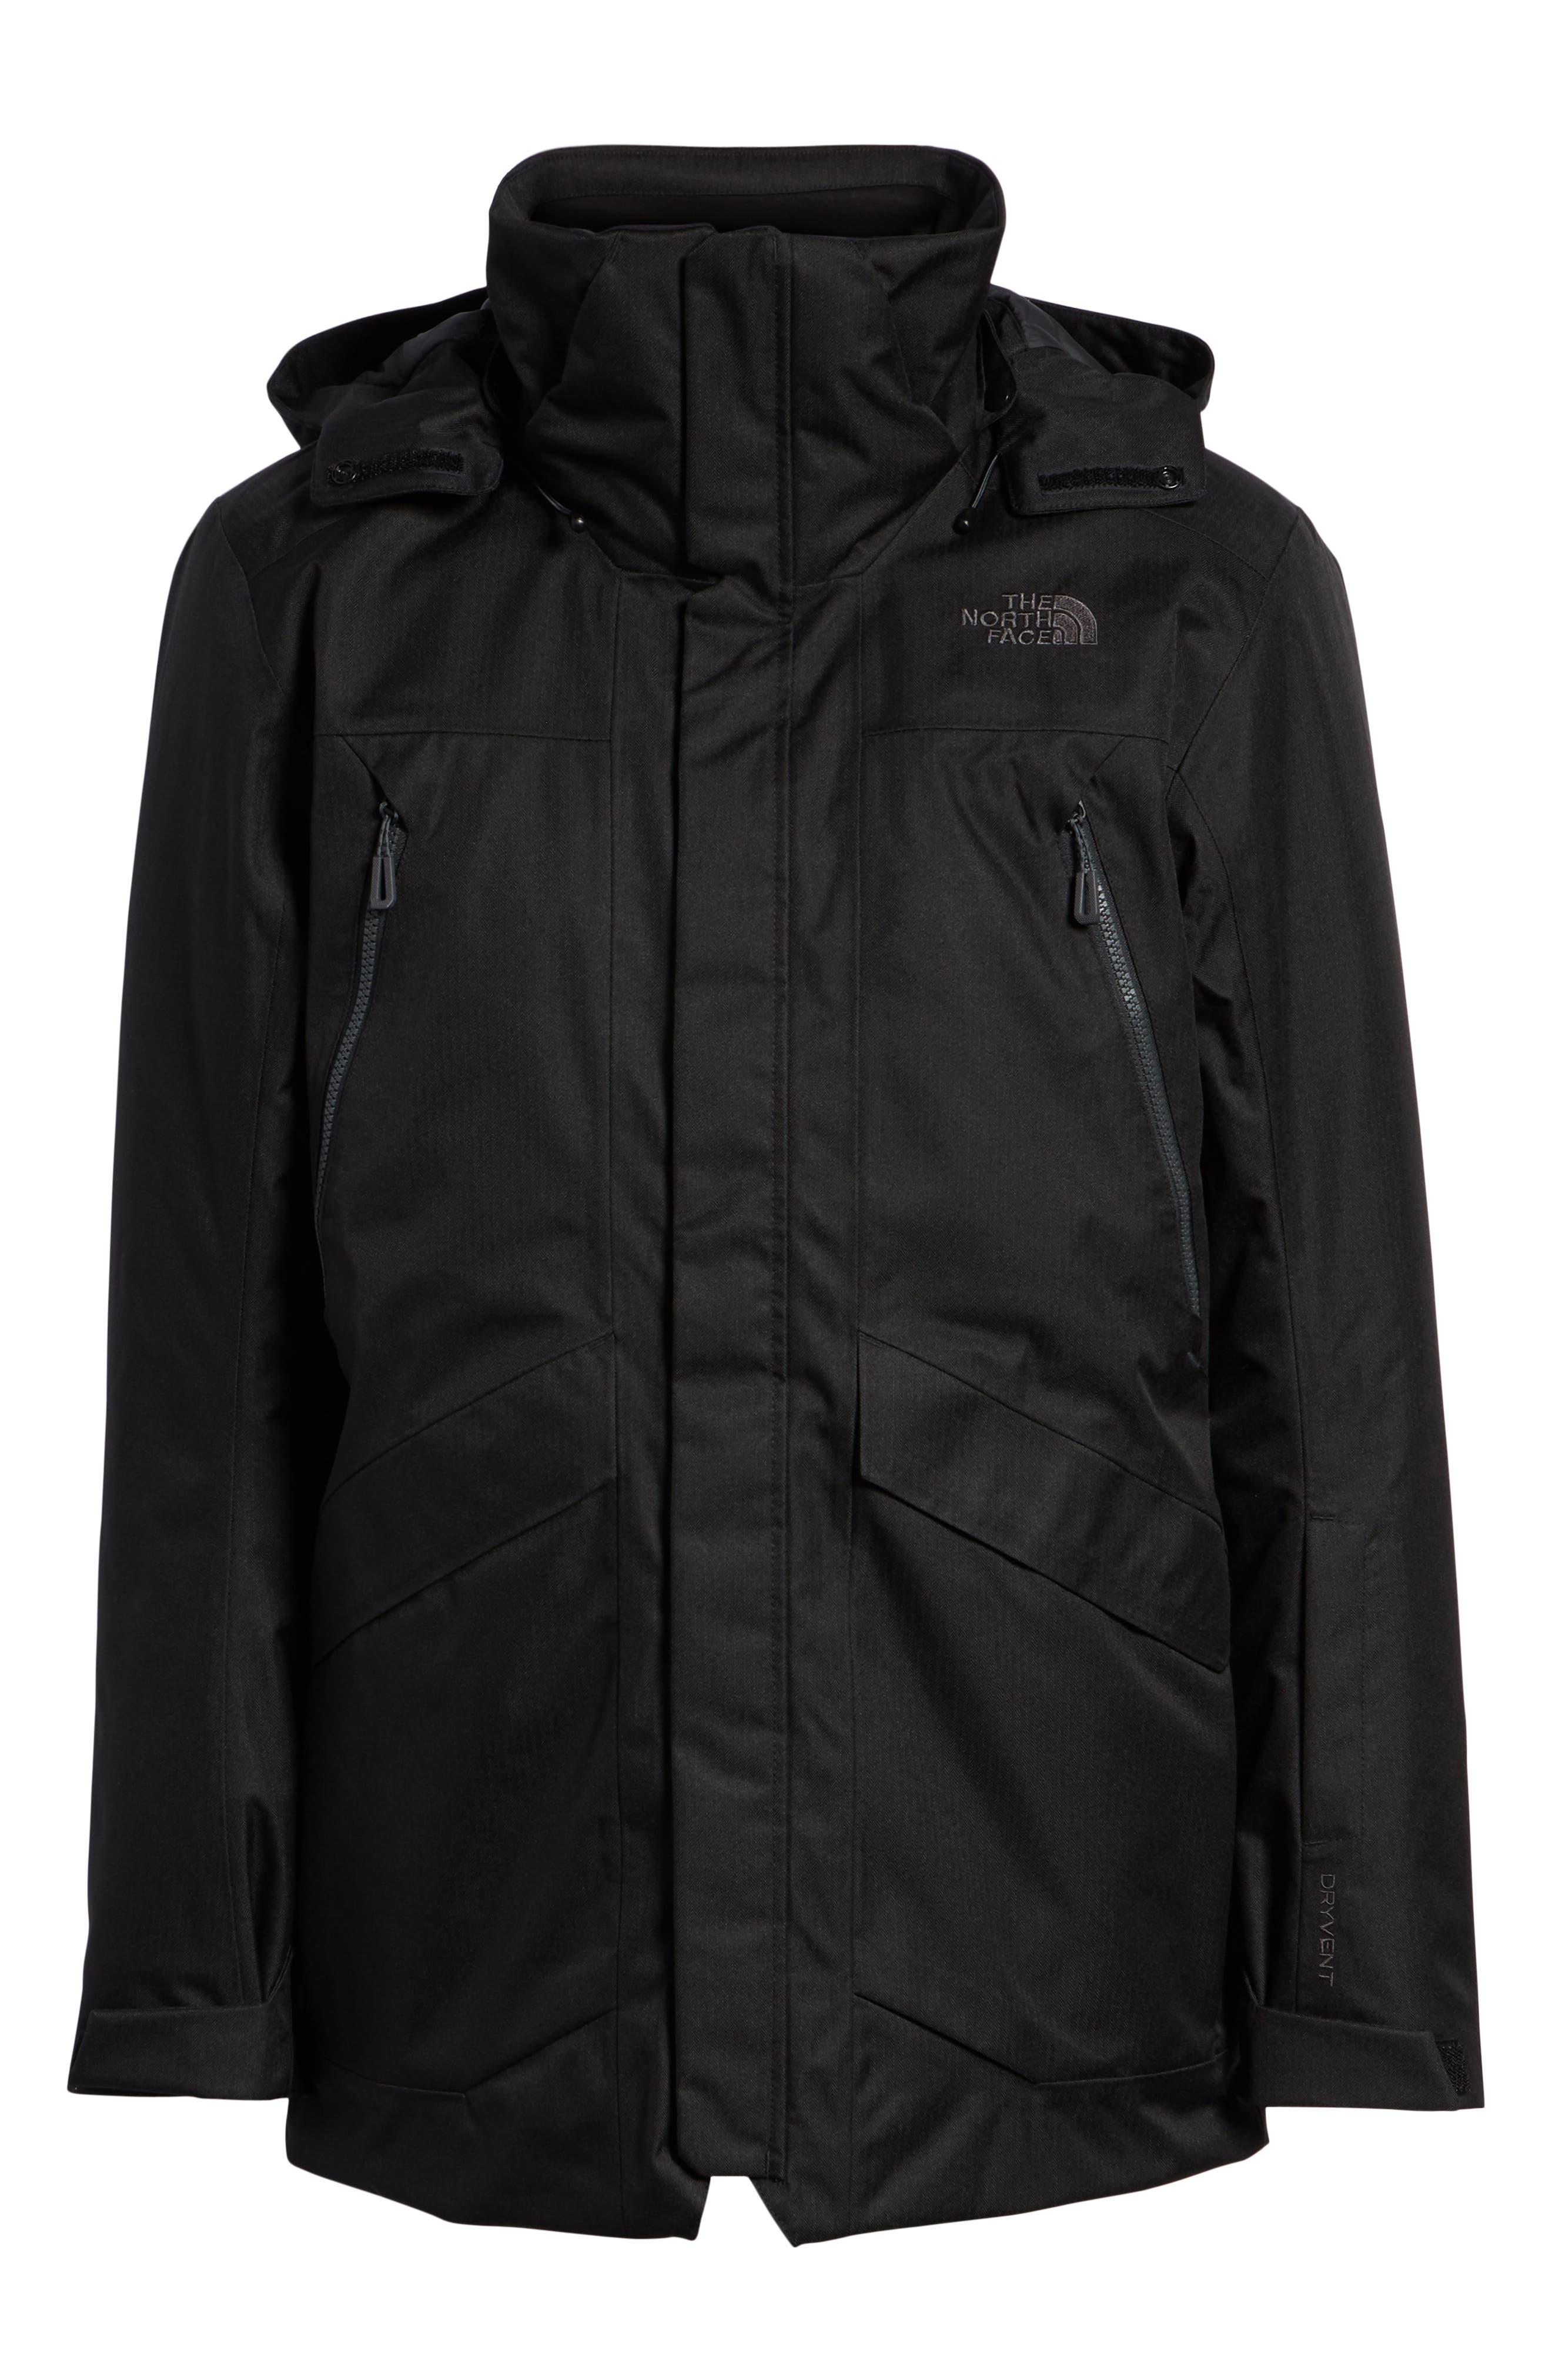 THE NORTH FACE, Gatekeeper Waterproof Jacket, Alternate thumbnail 6, color, 005